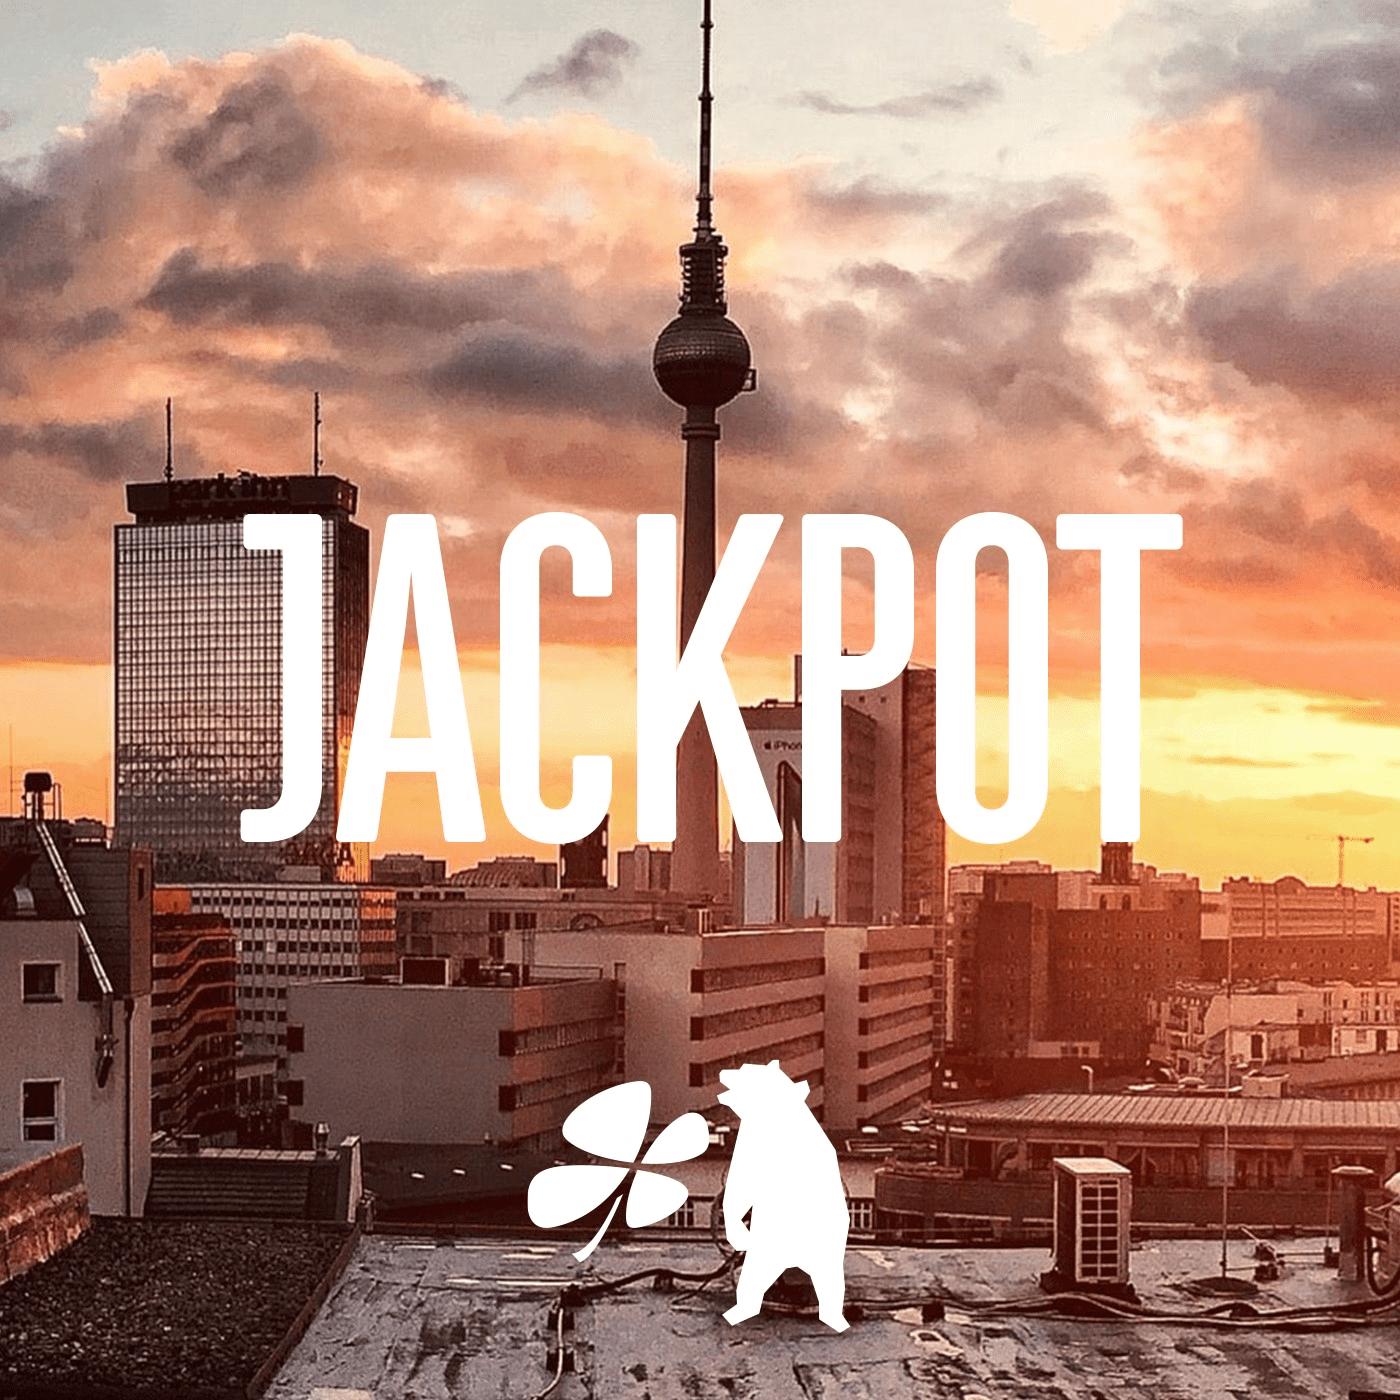 Jackpot LOTTO Podcast